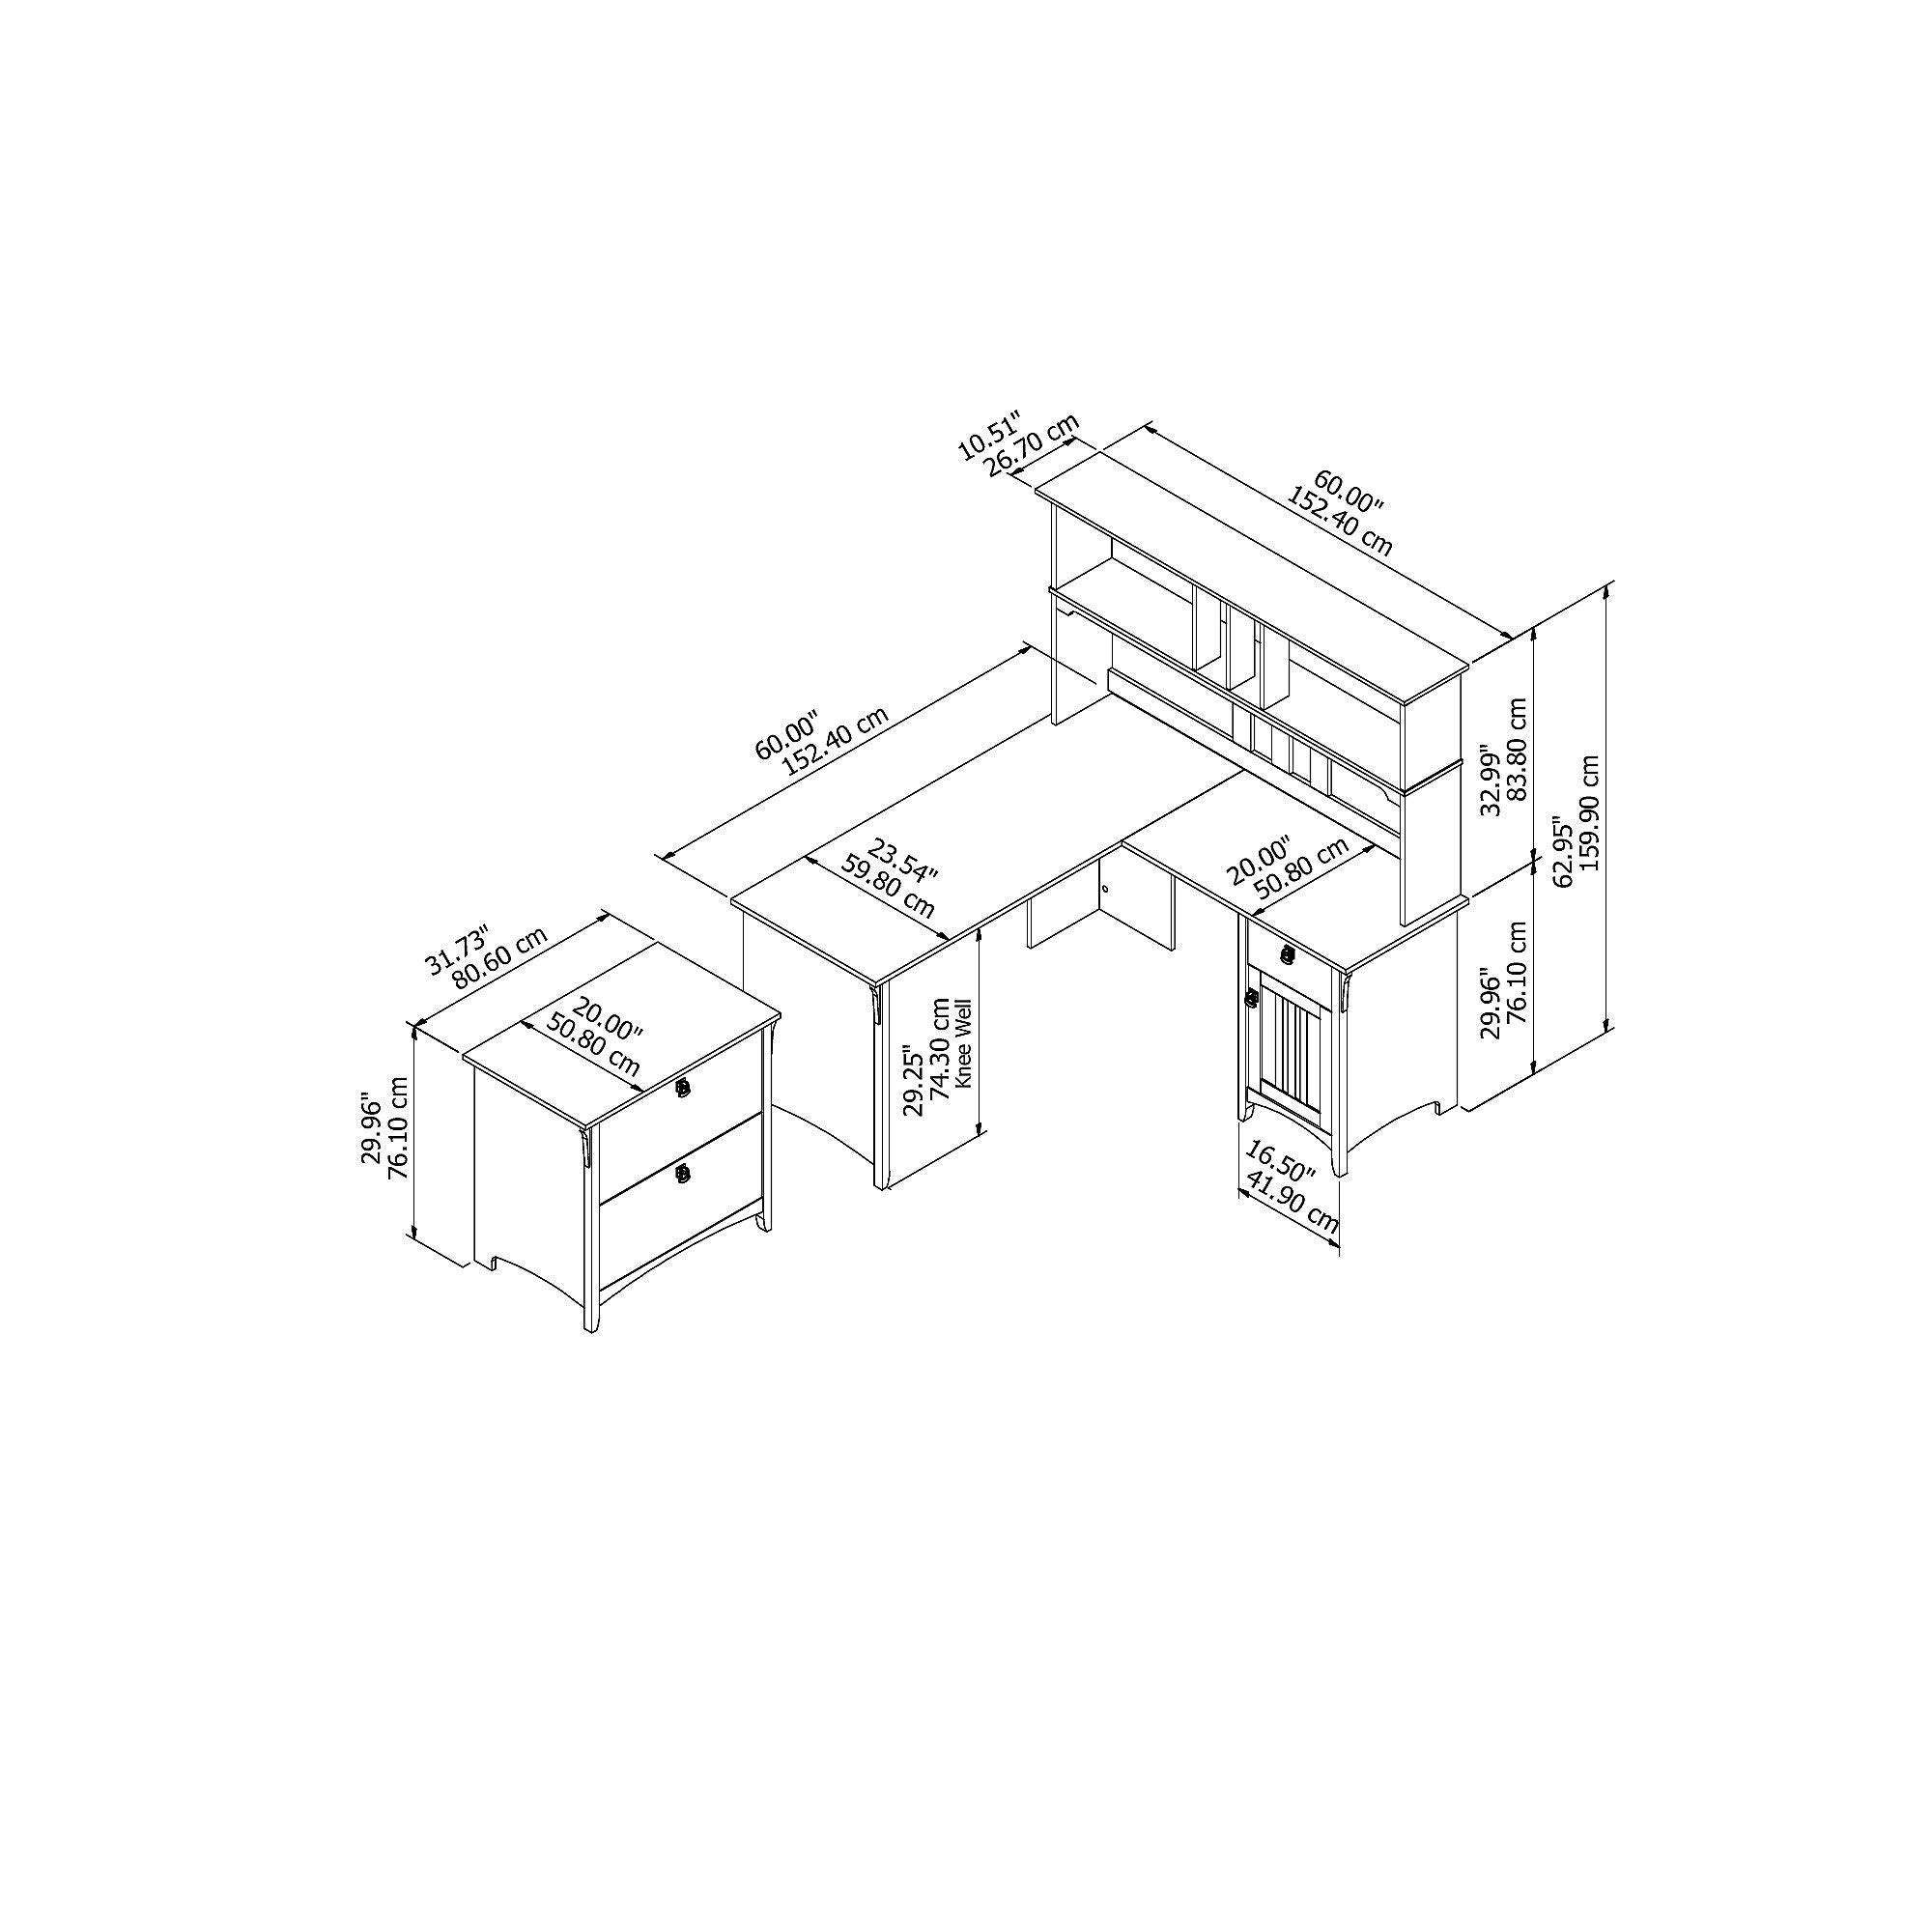 grumman llv wiring diagram 19 3 tramitesyconsultas co 94 Acura Integra Fuse Diagram llv wiring diagram ok alphatrend co u2022 rh ok alphatrend co camaro wiring diagram 1989 chevy s10 wiring diagram